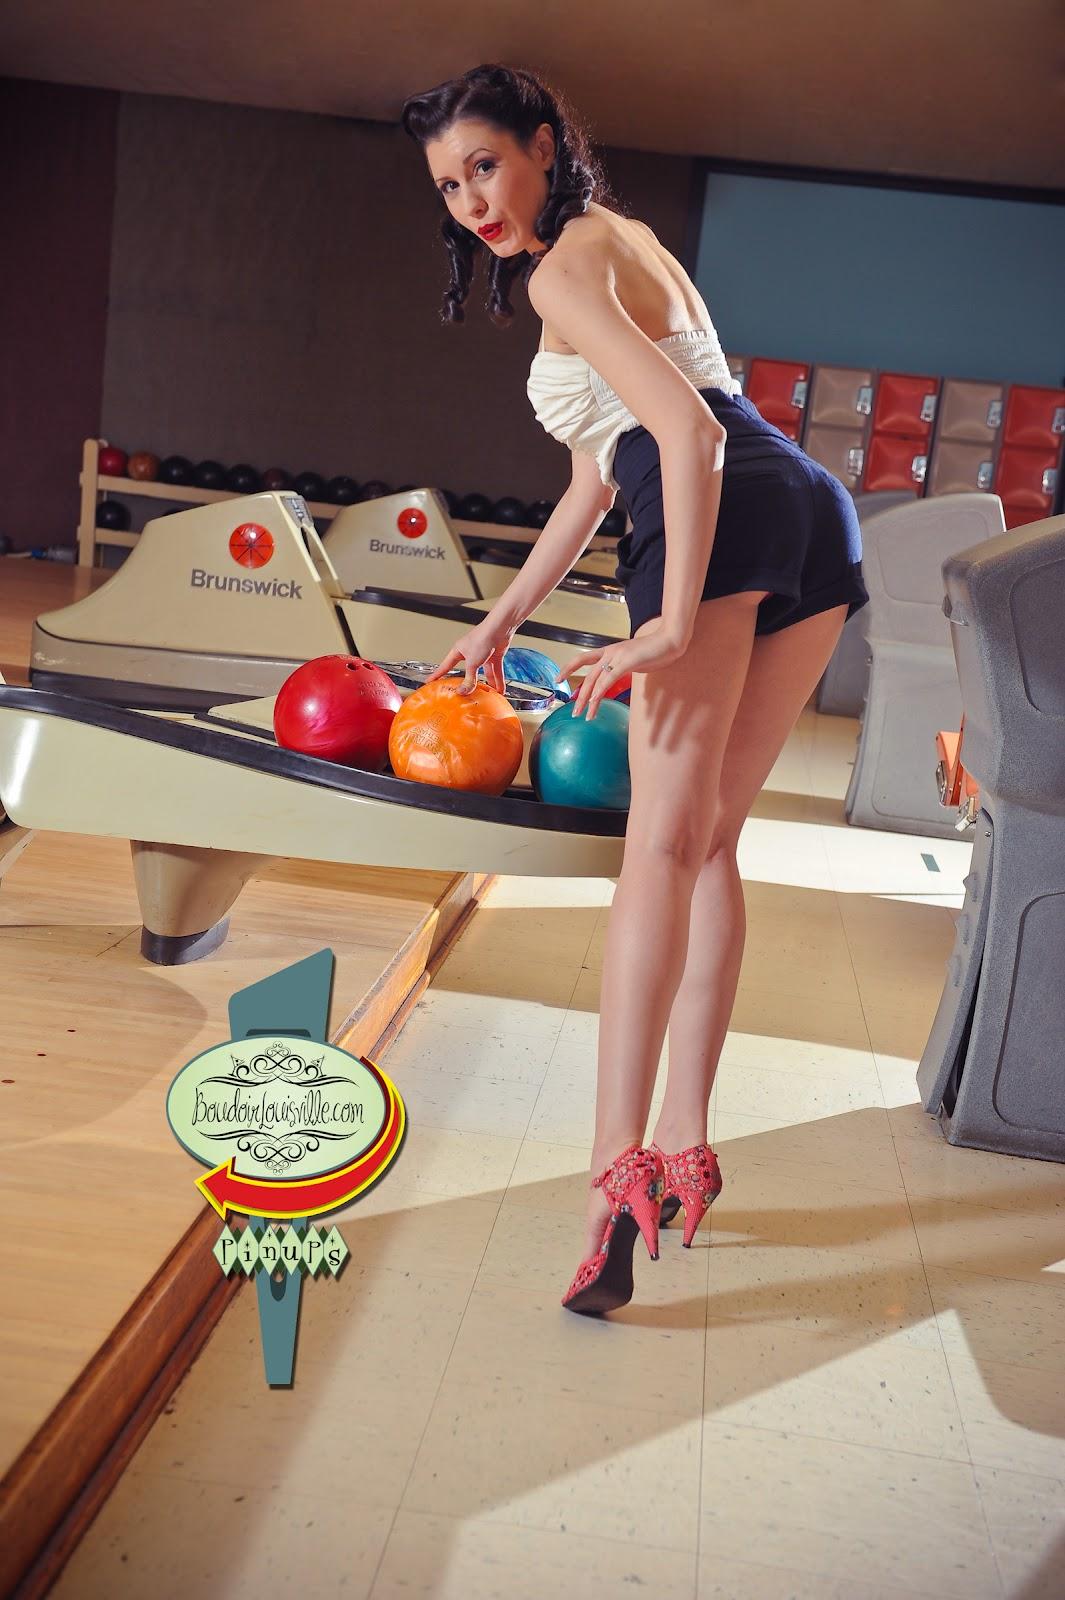 Pin Up Girl Shirts for Men - Bowling